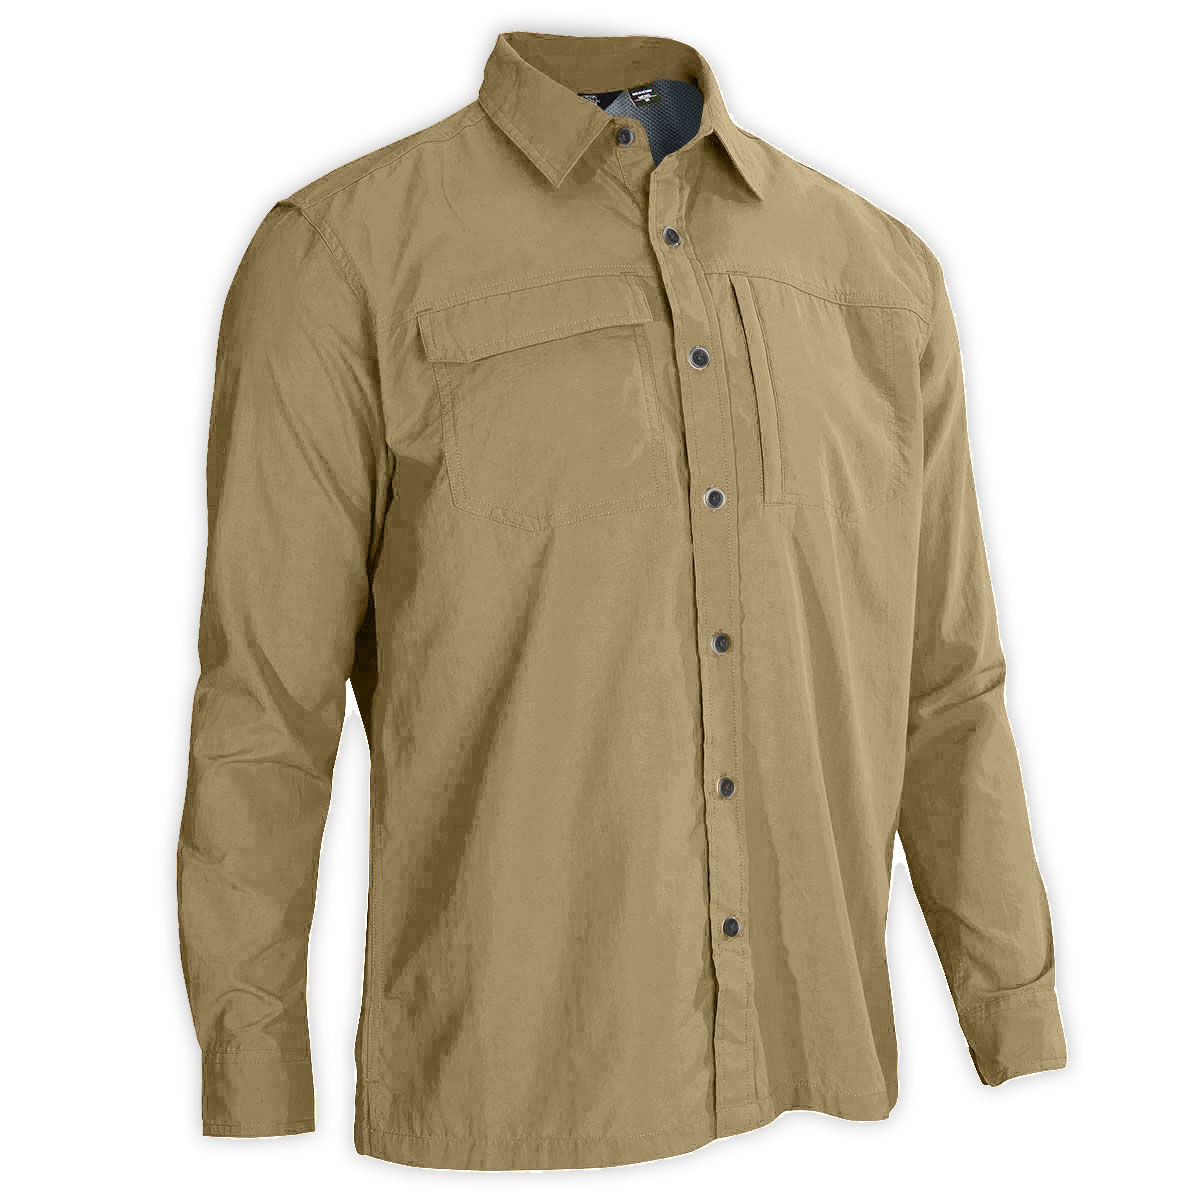 EMS Trailhead Shirt, L/S